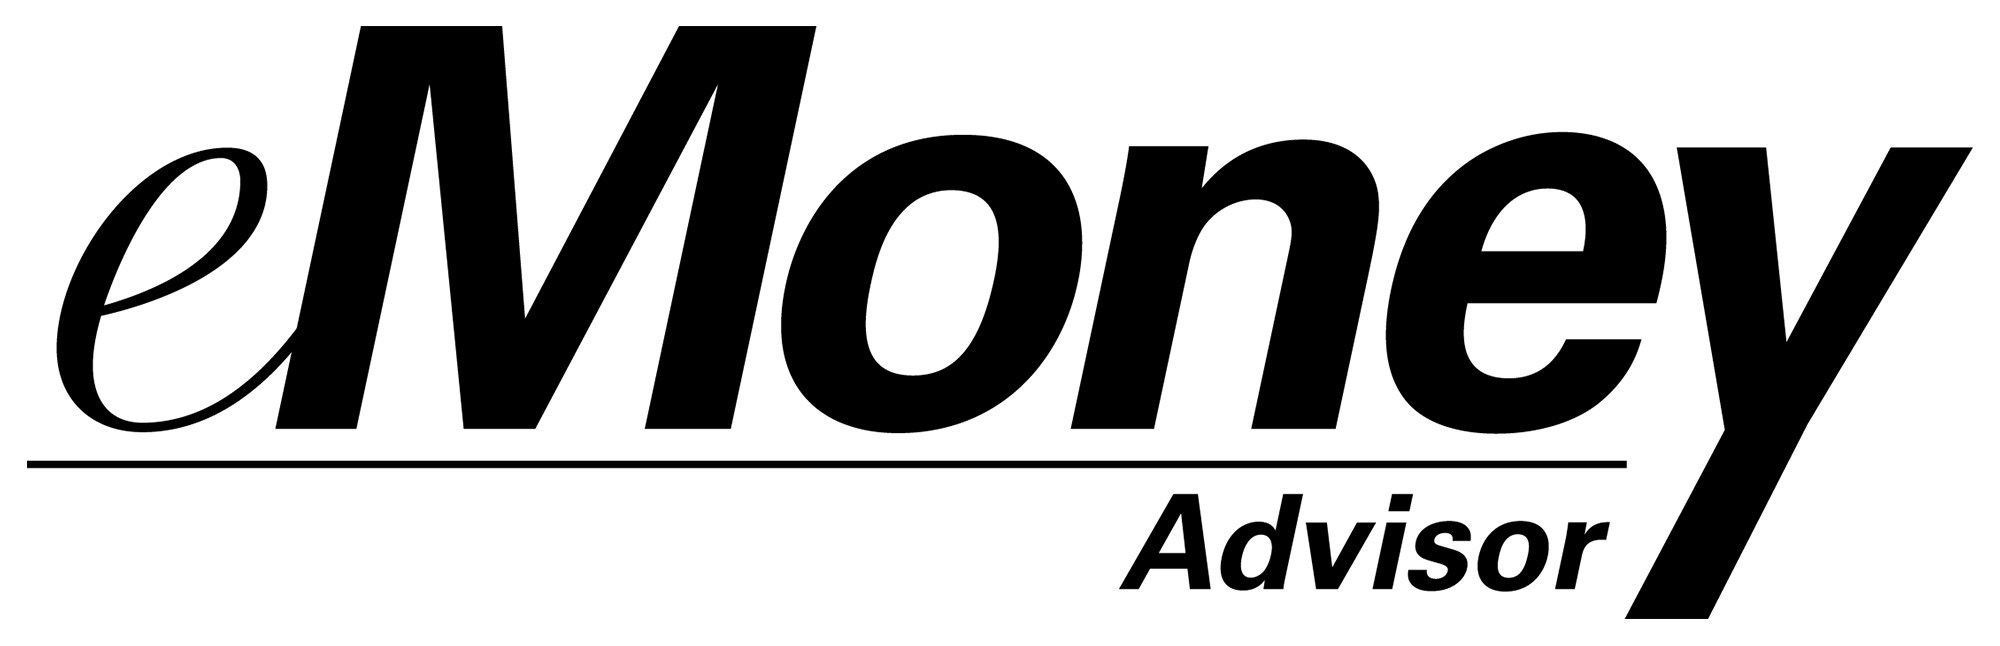 Financial Planning Website